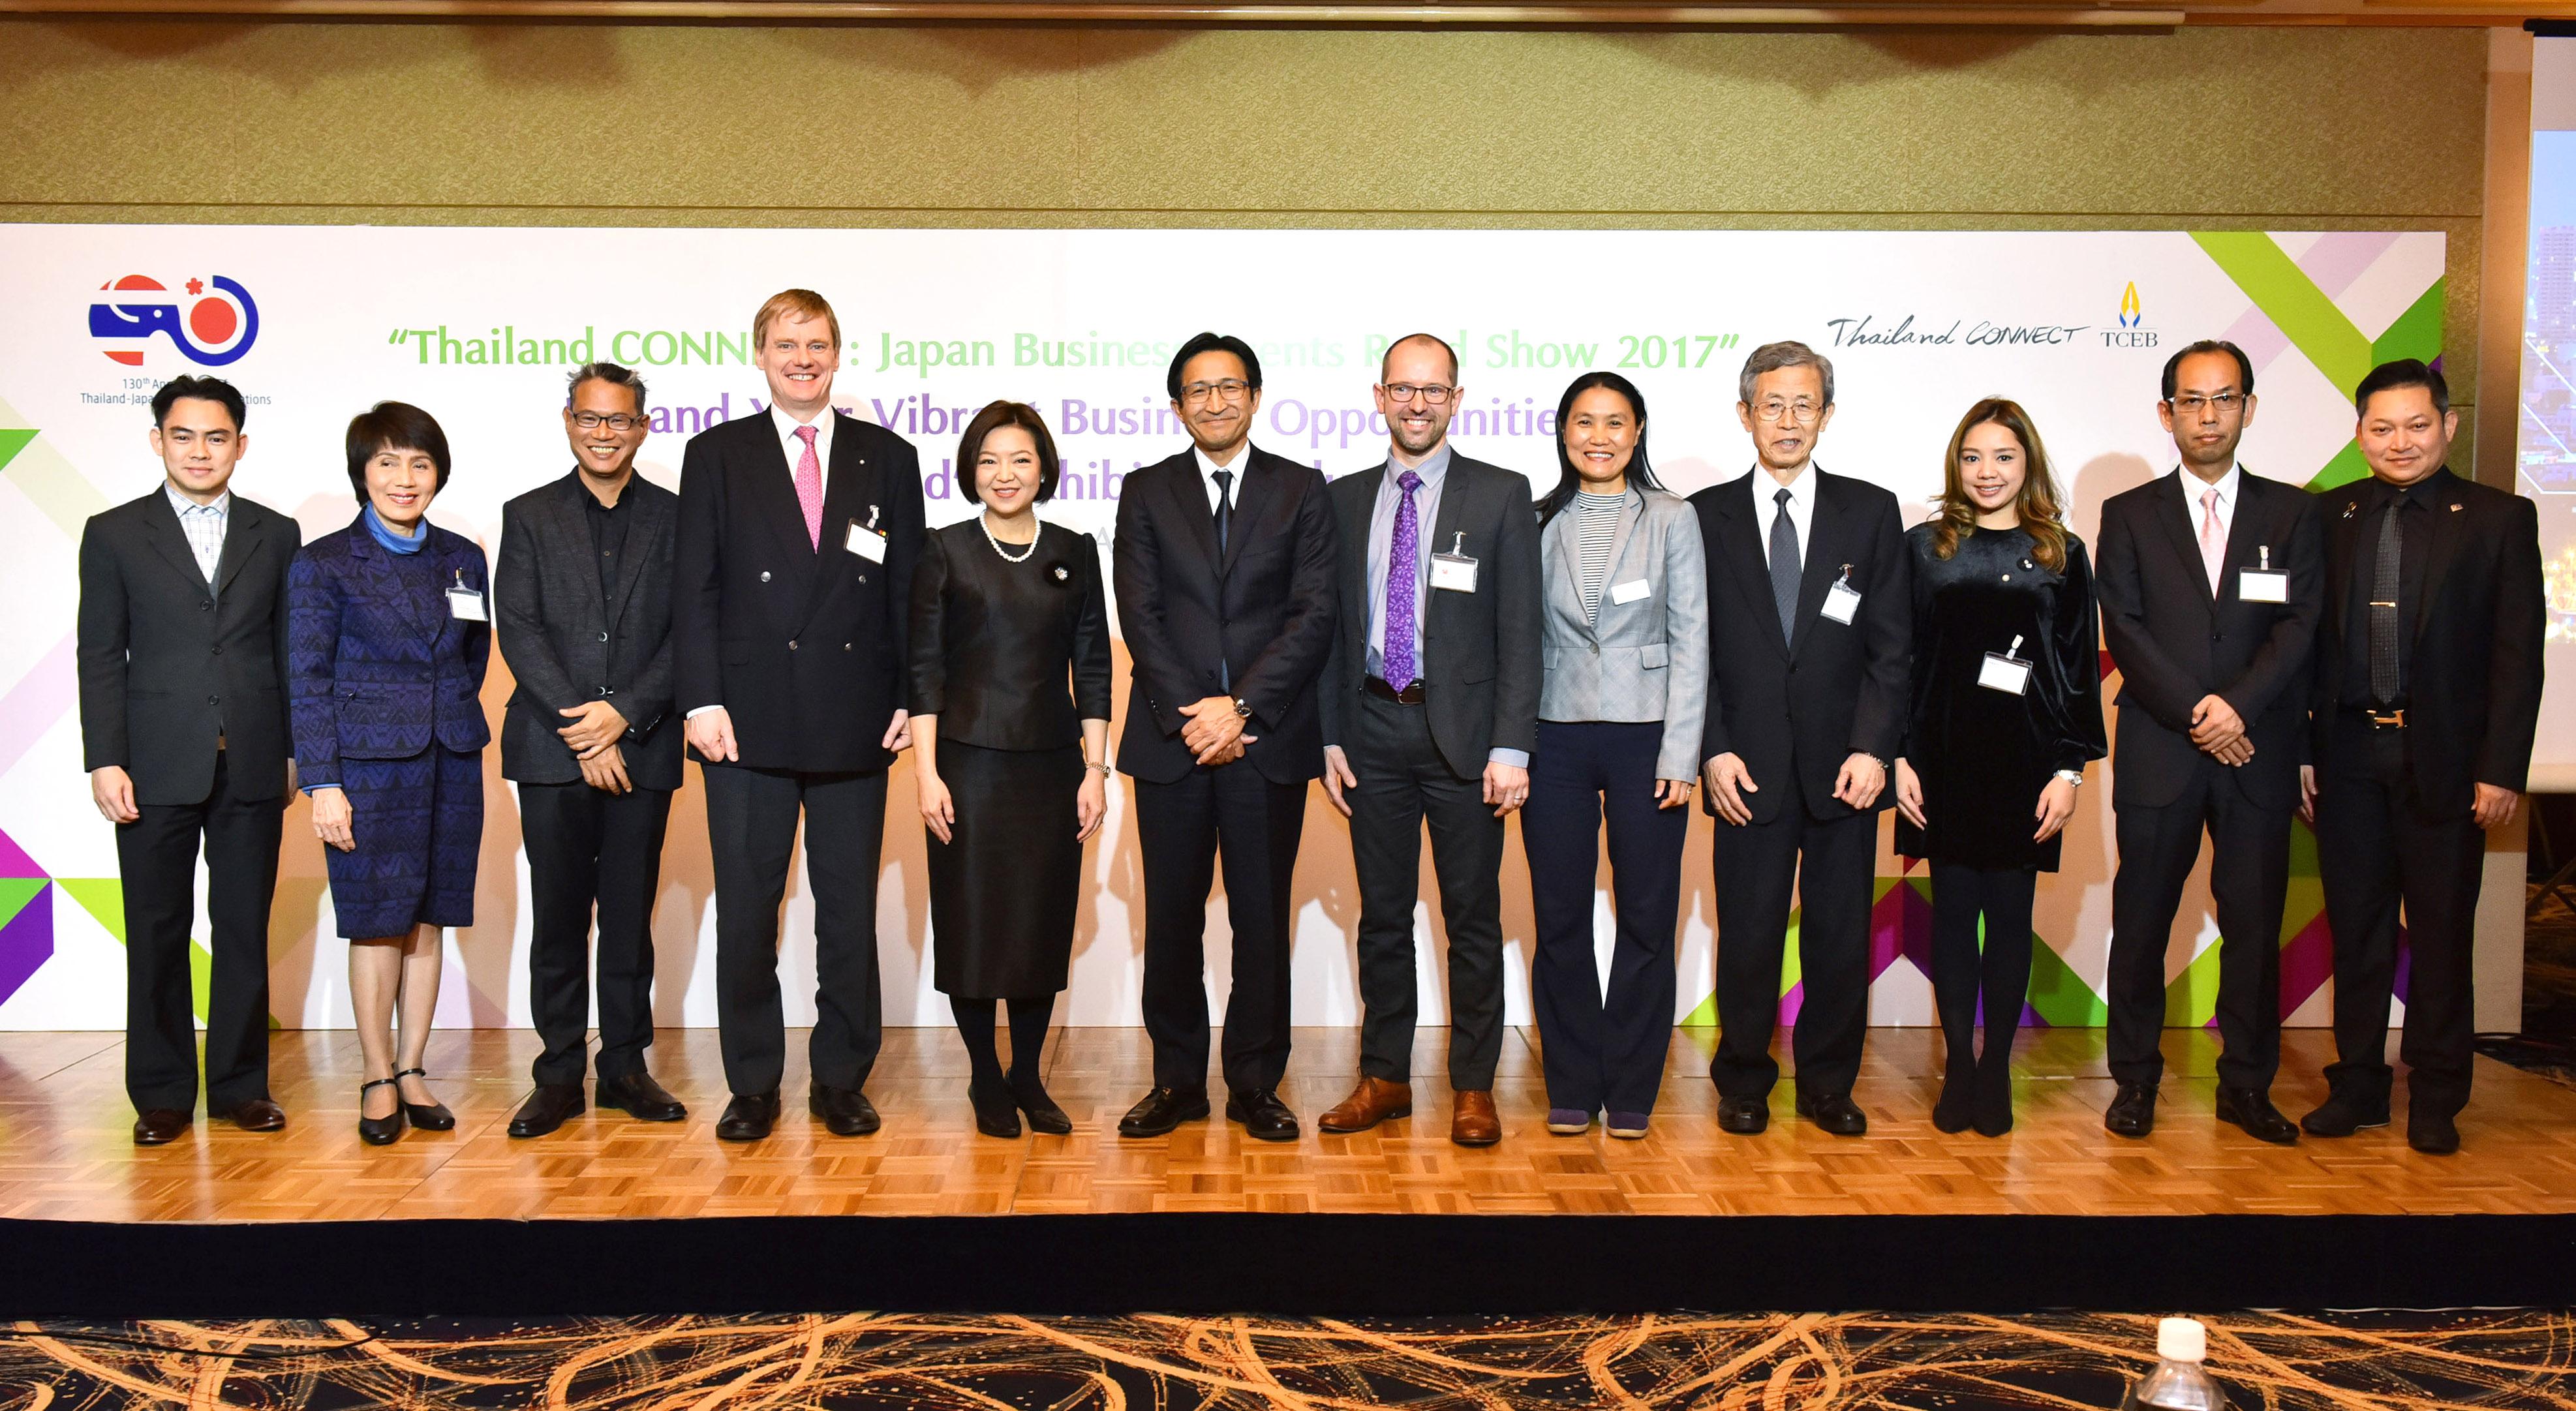 TTS 2017 ร่วมโร้ดโชว์ TCEB ณ ประเทศญี่ปุ่น พร้อมเดินหน้าประชาสัมพันธ์งานแก่กลุ่มเป้าหมายญี่ปุ่น